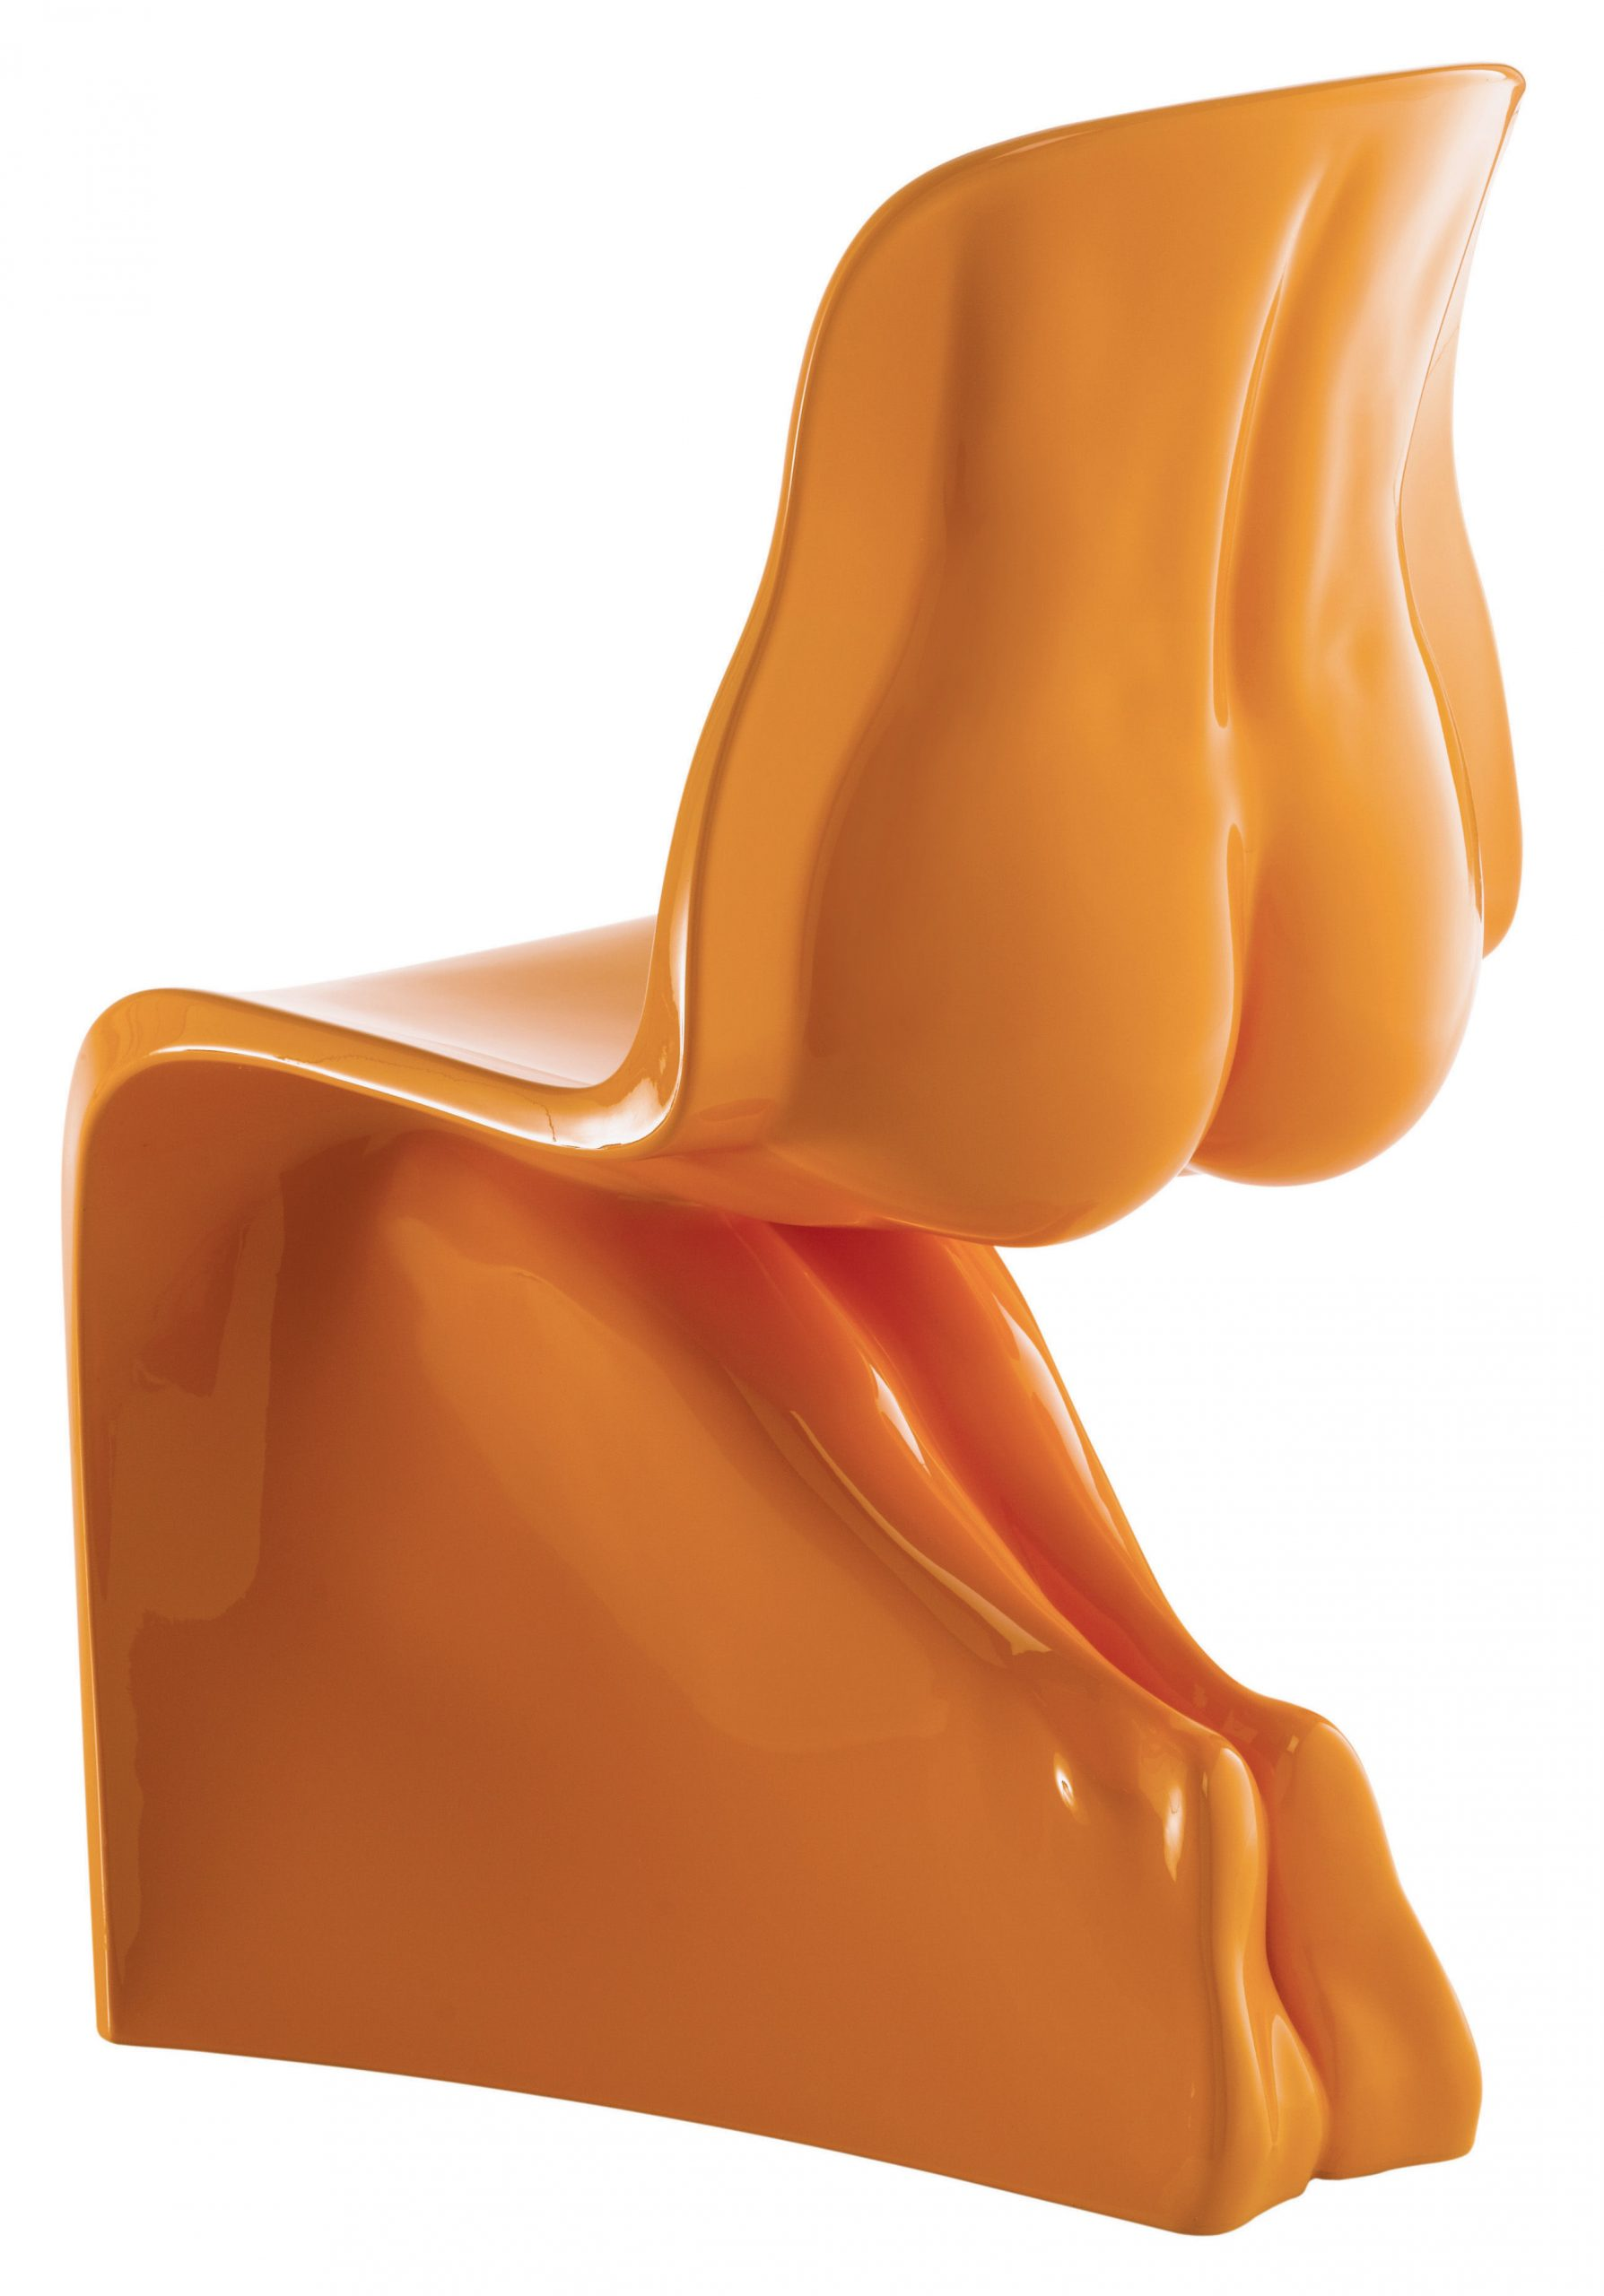 Ihr Stuhl - Casamania Orange November lackierte Version Fabio Novembre